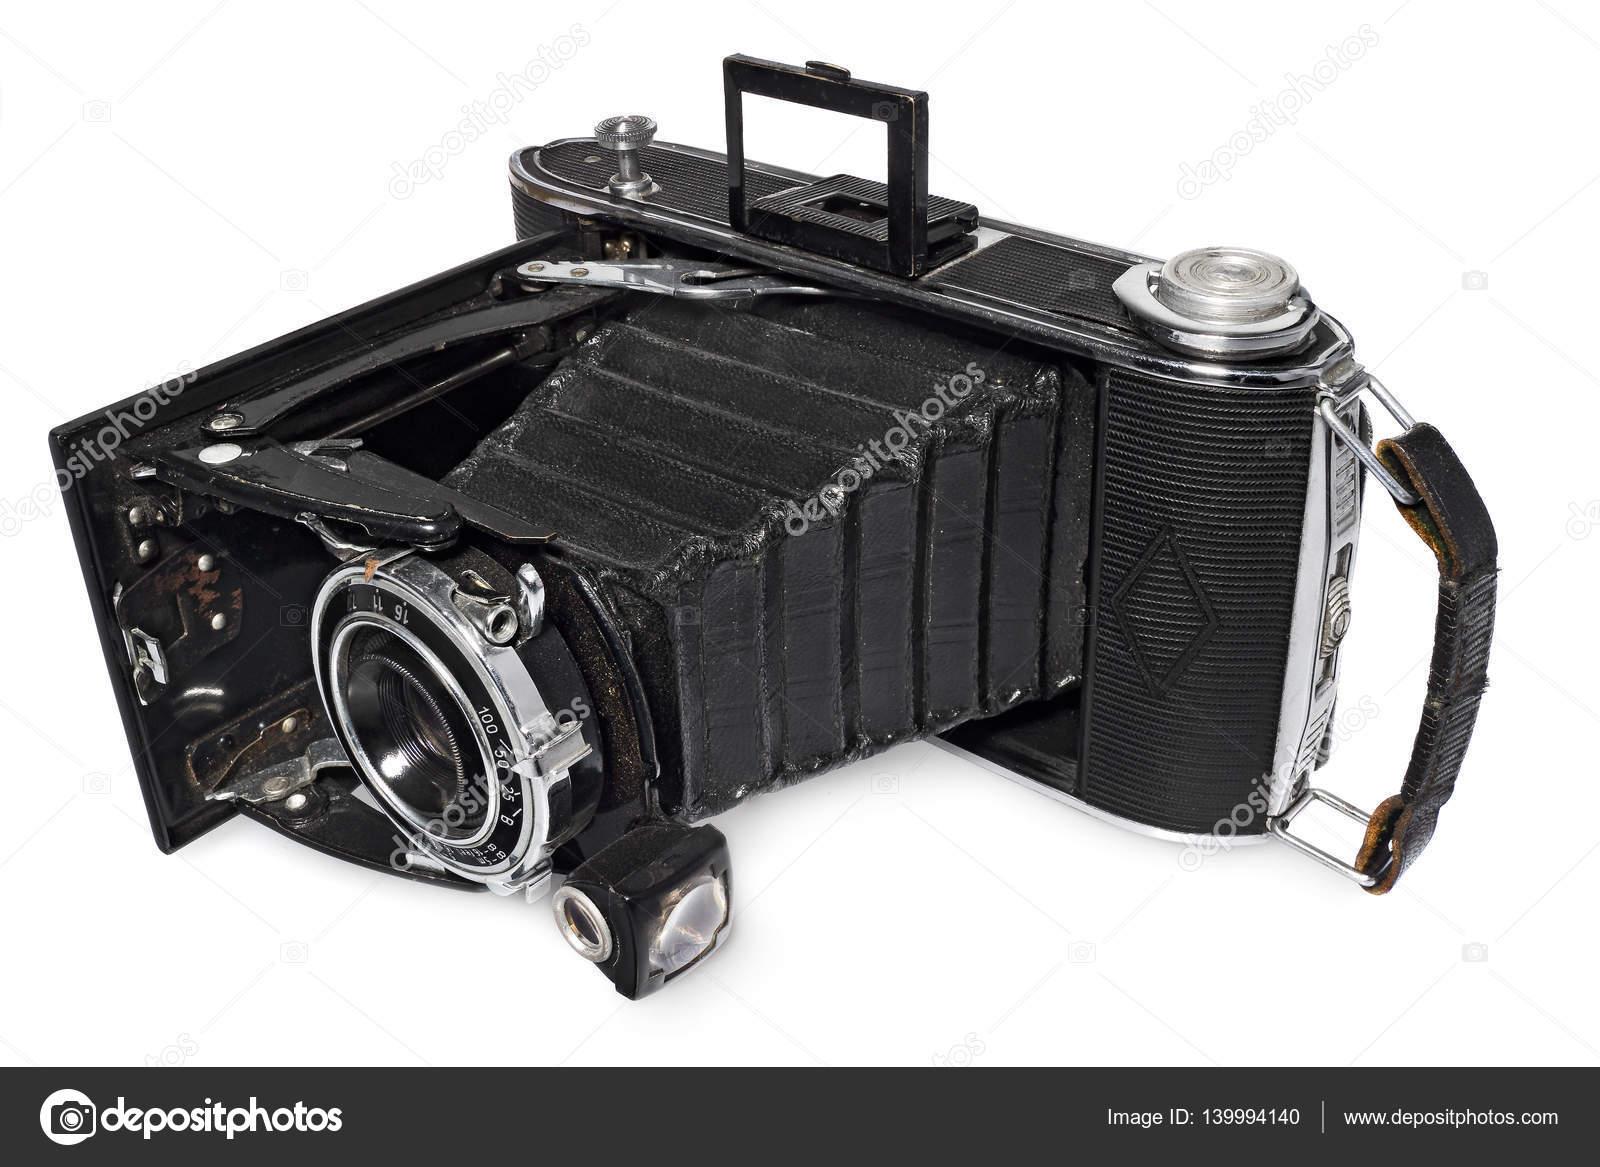 ancien antique noir poche cam ra mod le d appareil photo agfa billy record photographie. Black Bedroom Furniture Sets. Home Design Ideas